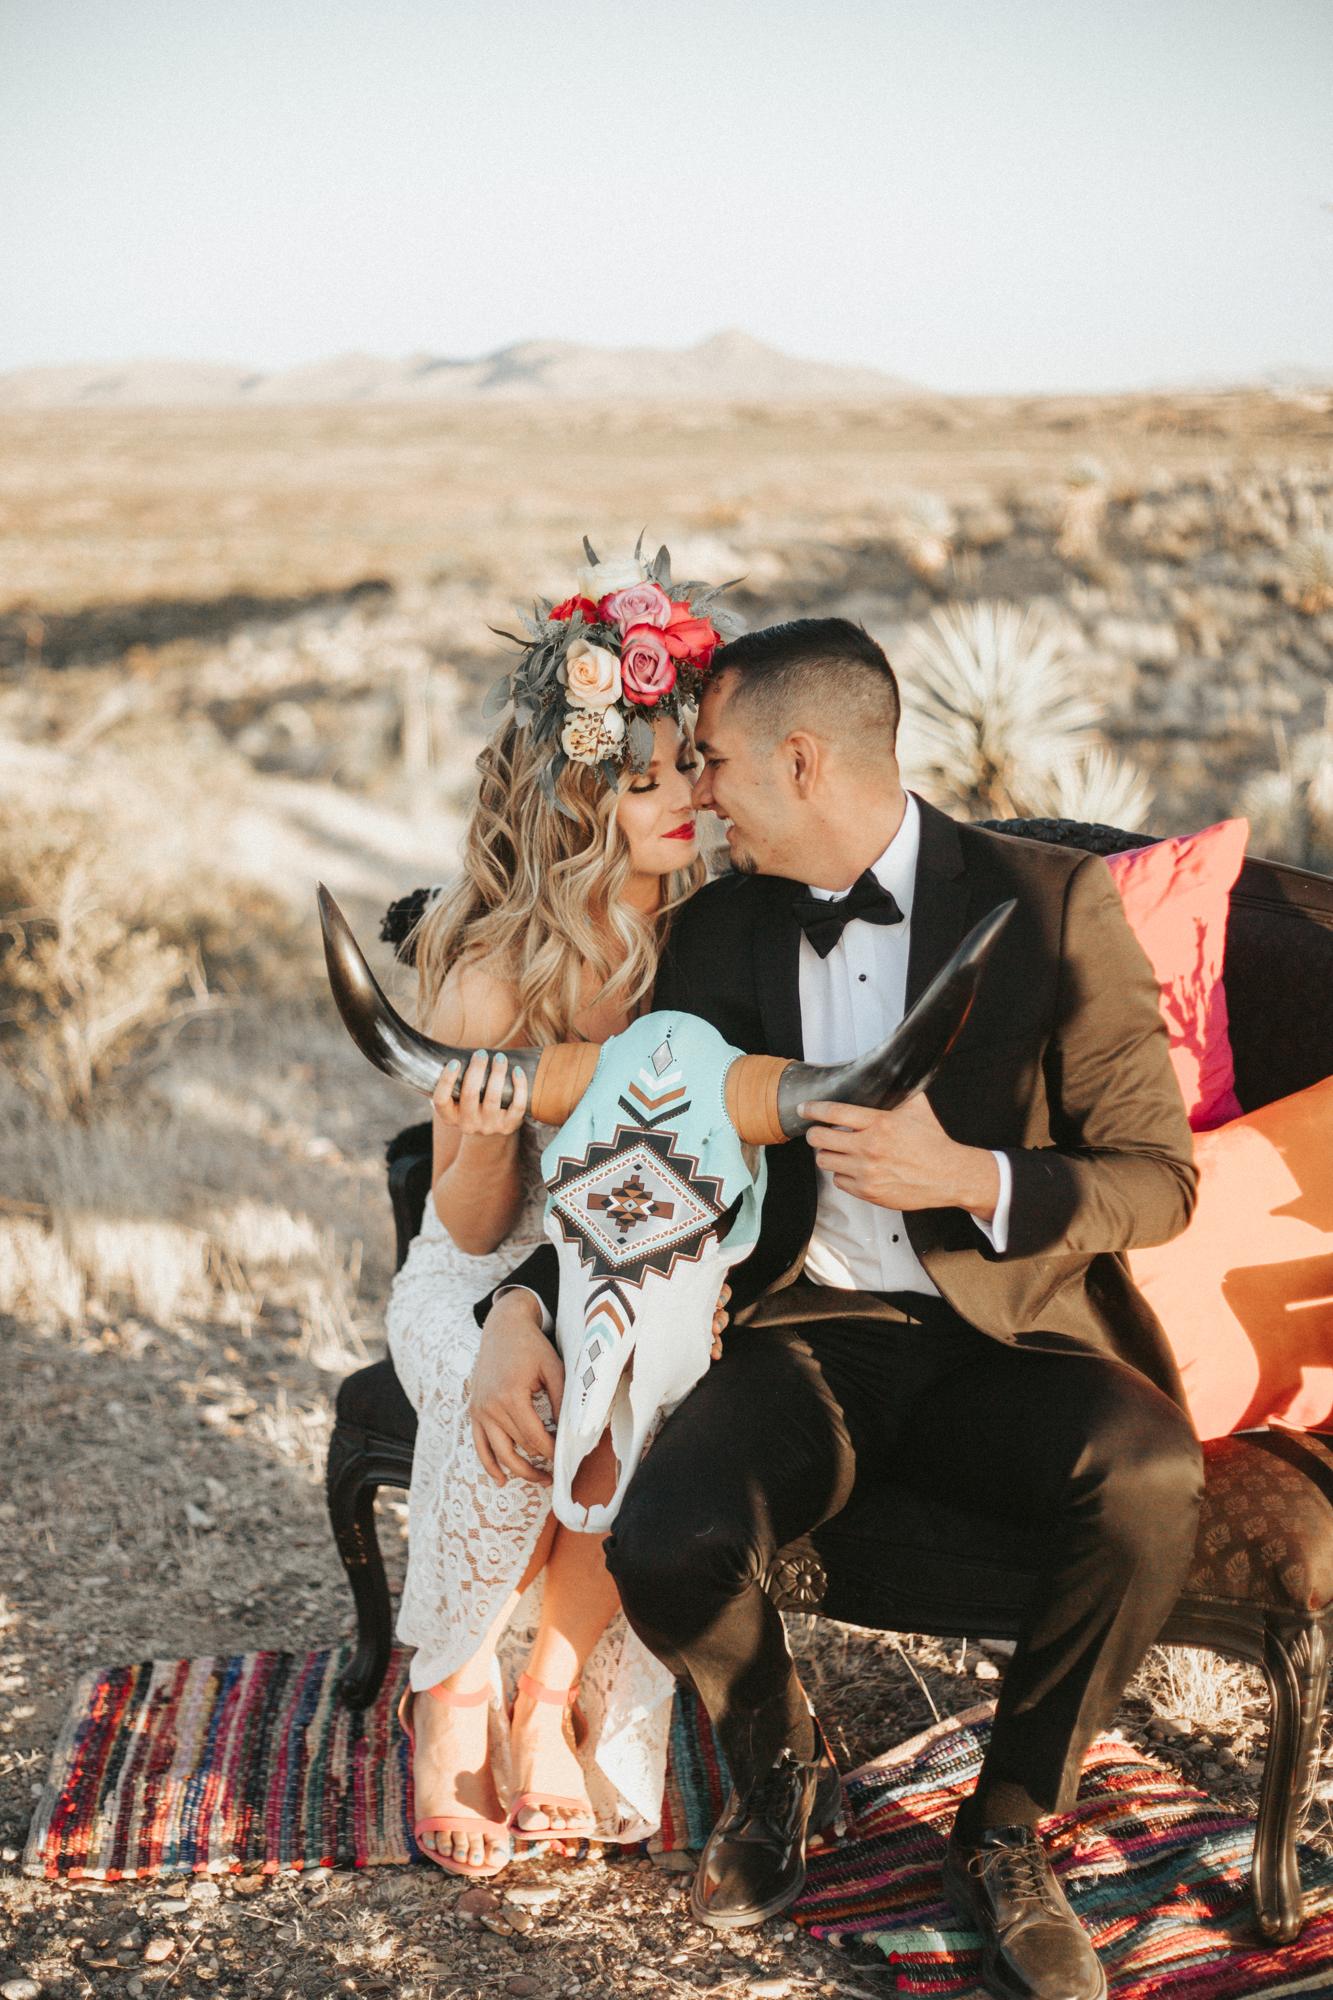 NEW MEXICO - Southwest Styled ElopementVendors:Hair/makeup:Ashley Apodaca HairDecor/Styling:Three SistersFlorals:Kern Place FloristTux:Renee's BridalJewelry:CheekyInvites/Calligraphy:Letters and SuchSkull:Spiced InkDonkey:Katlyn Gray/ Captain JackCake:ChantillyCookies:Cara's CreationsPhotographer & Video:Jazmine Rubio Photo + Film